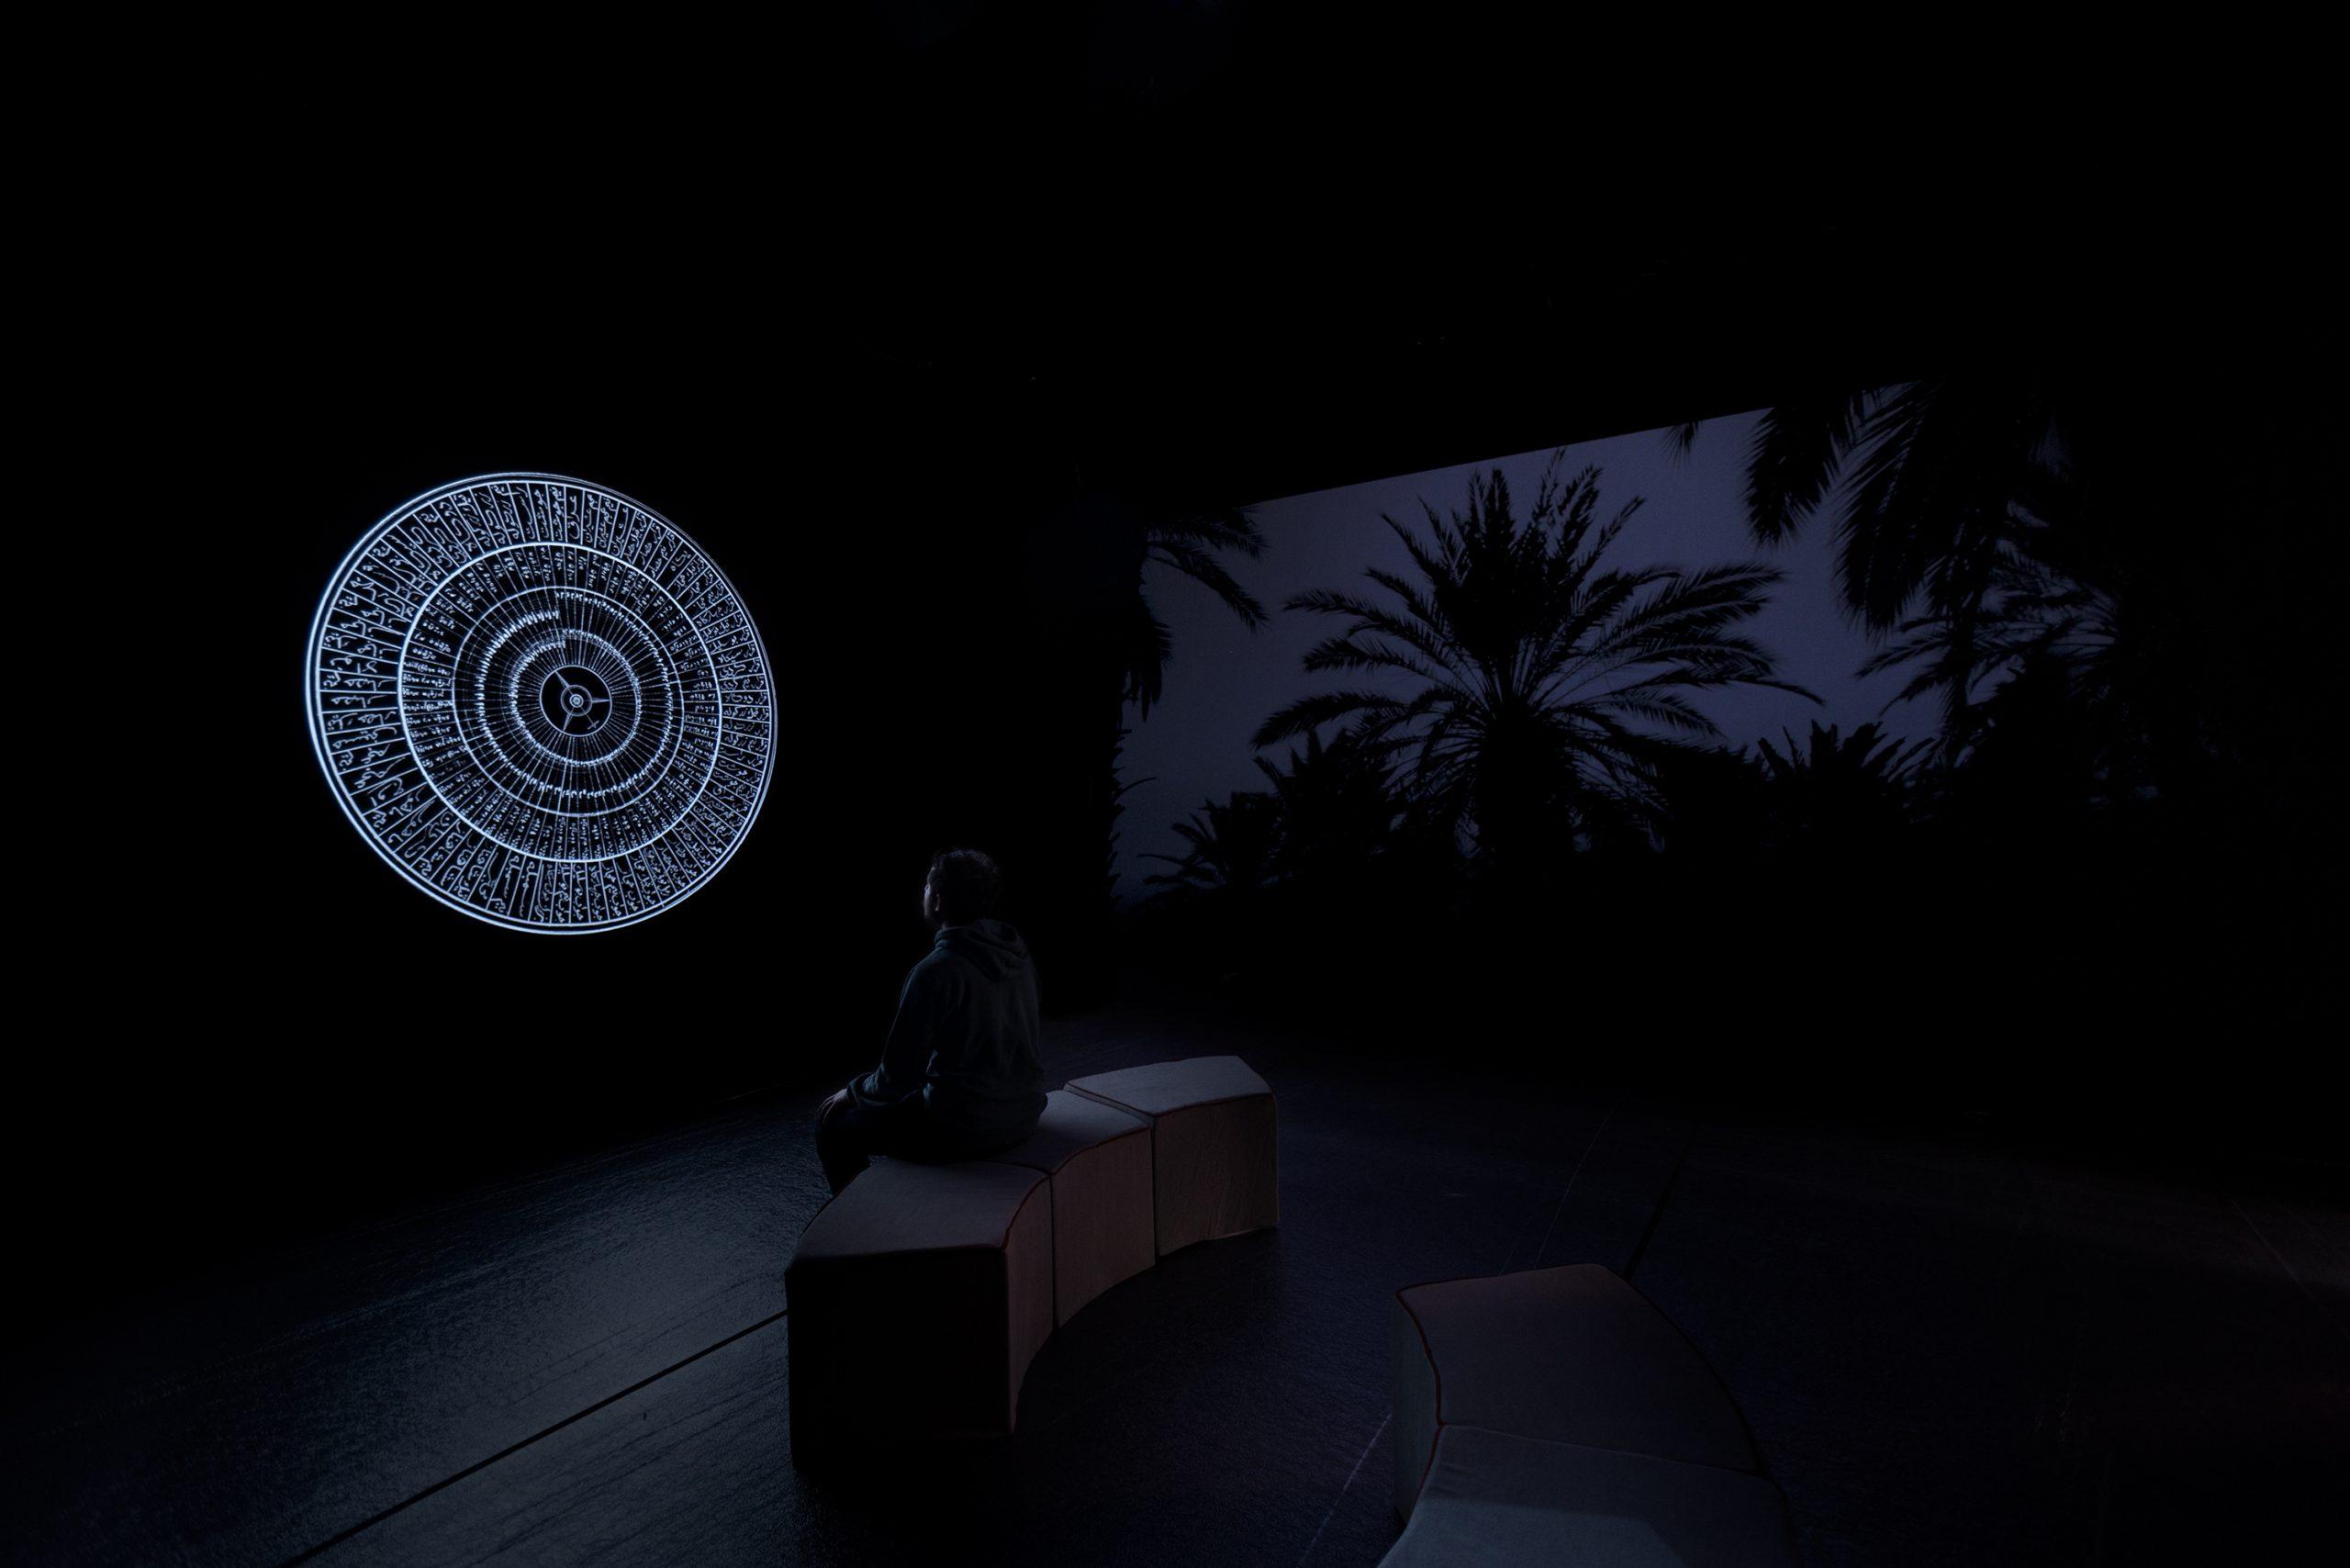 Maqamat installation view, Artissima 2018 (2)